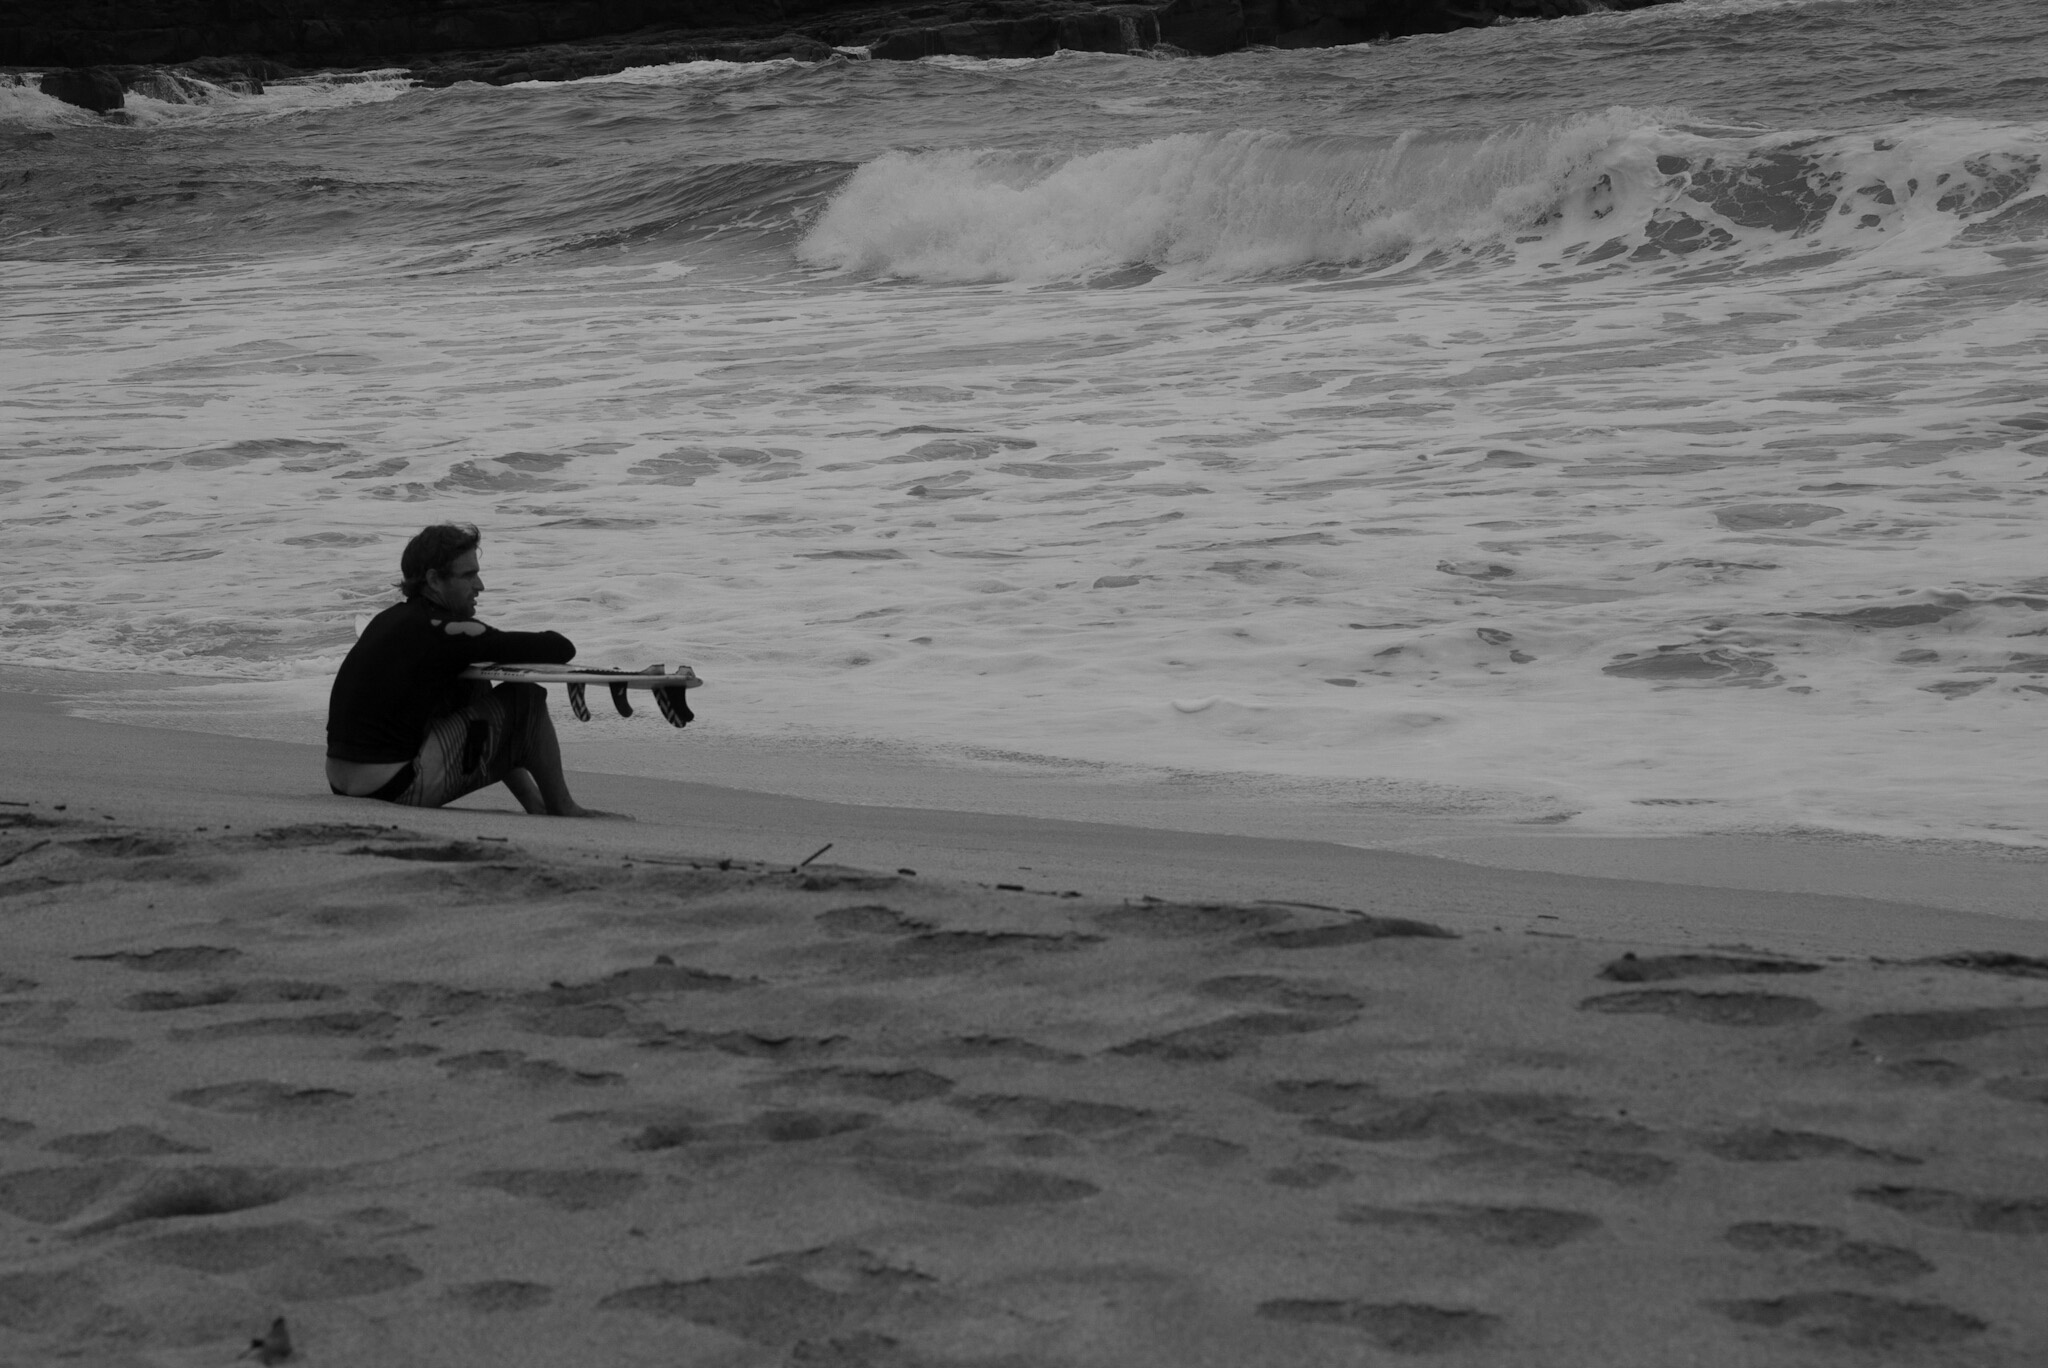 Surfer judging the waves - Lumaha'i beach, Kauai